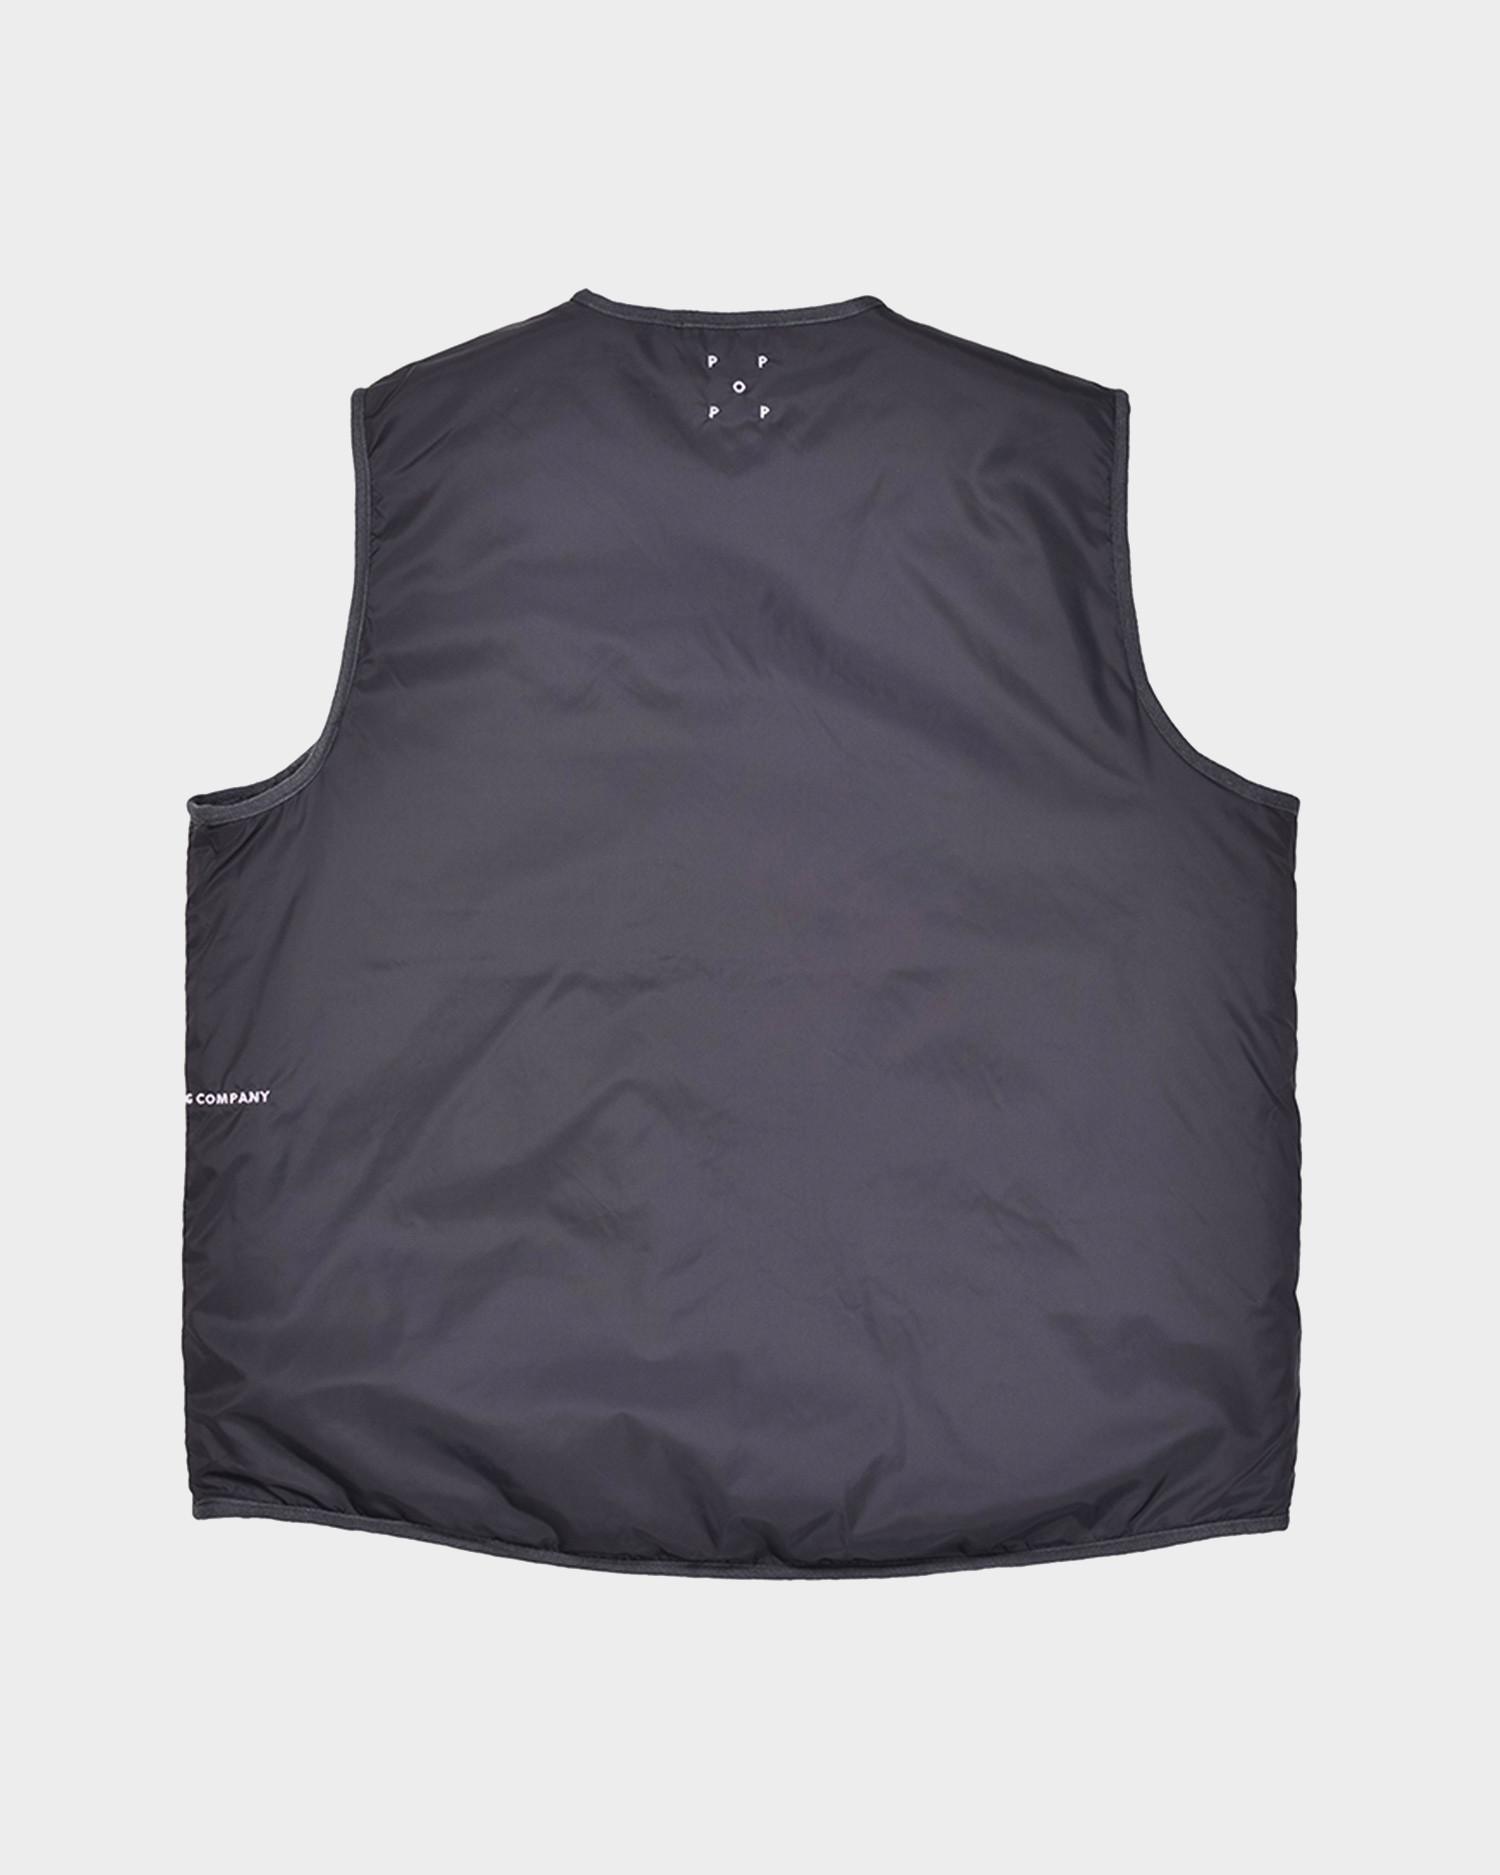 Pop Trading Company Harold Reversible Vest Anthracite